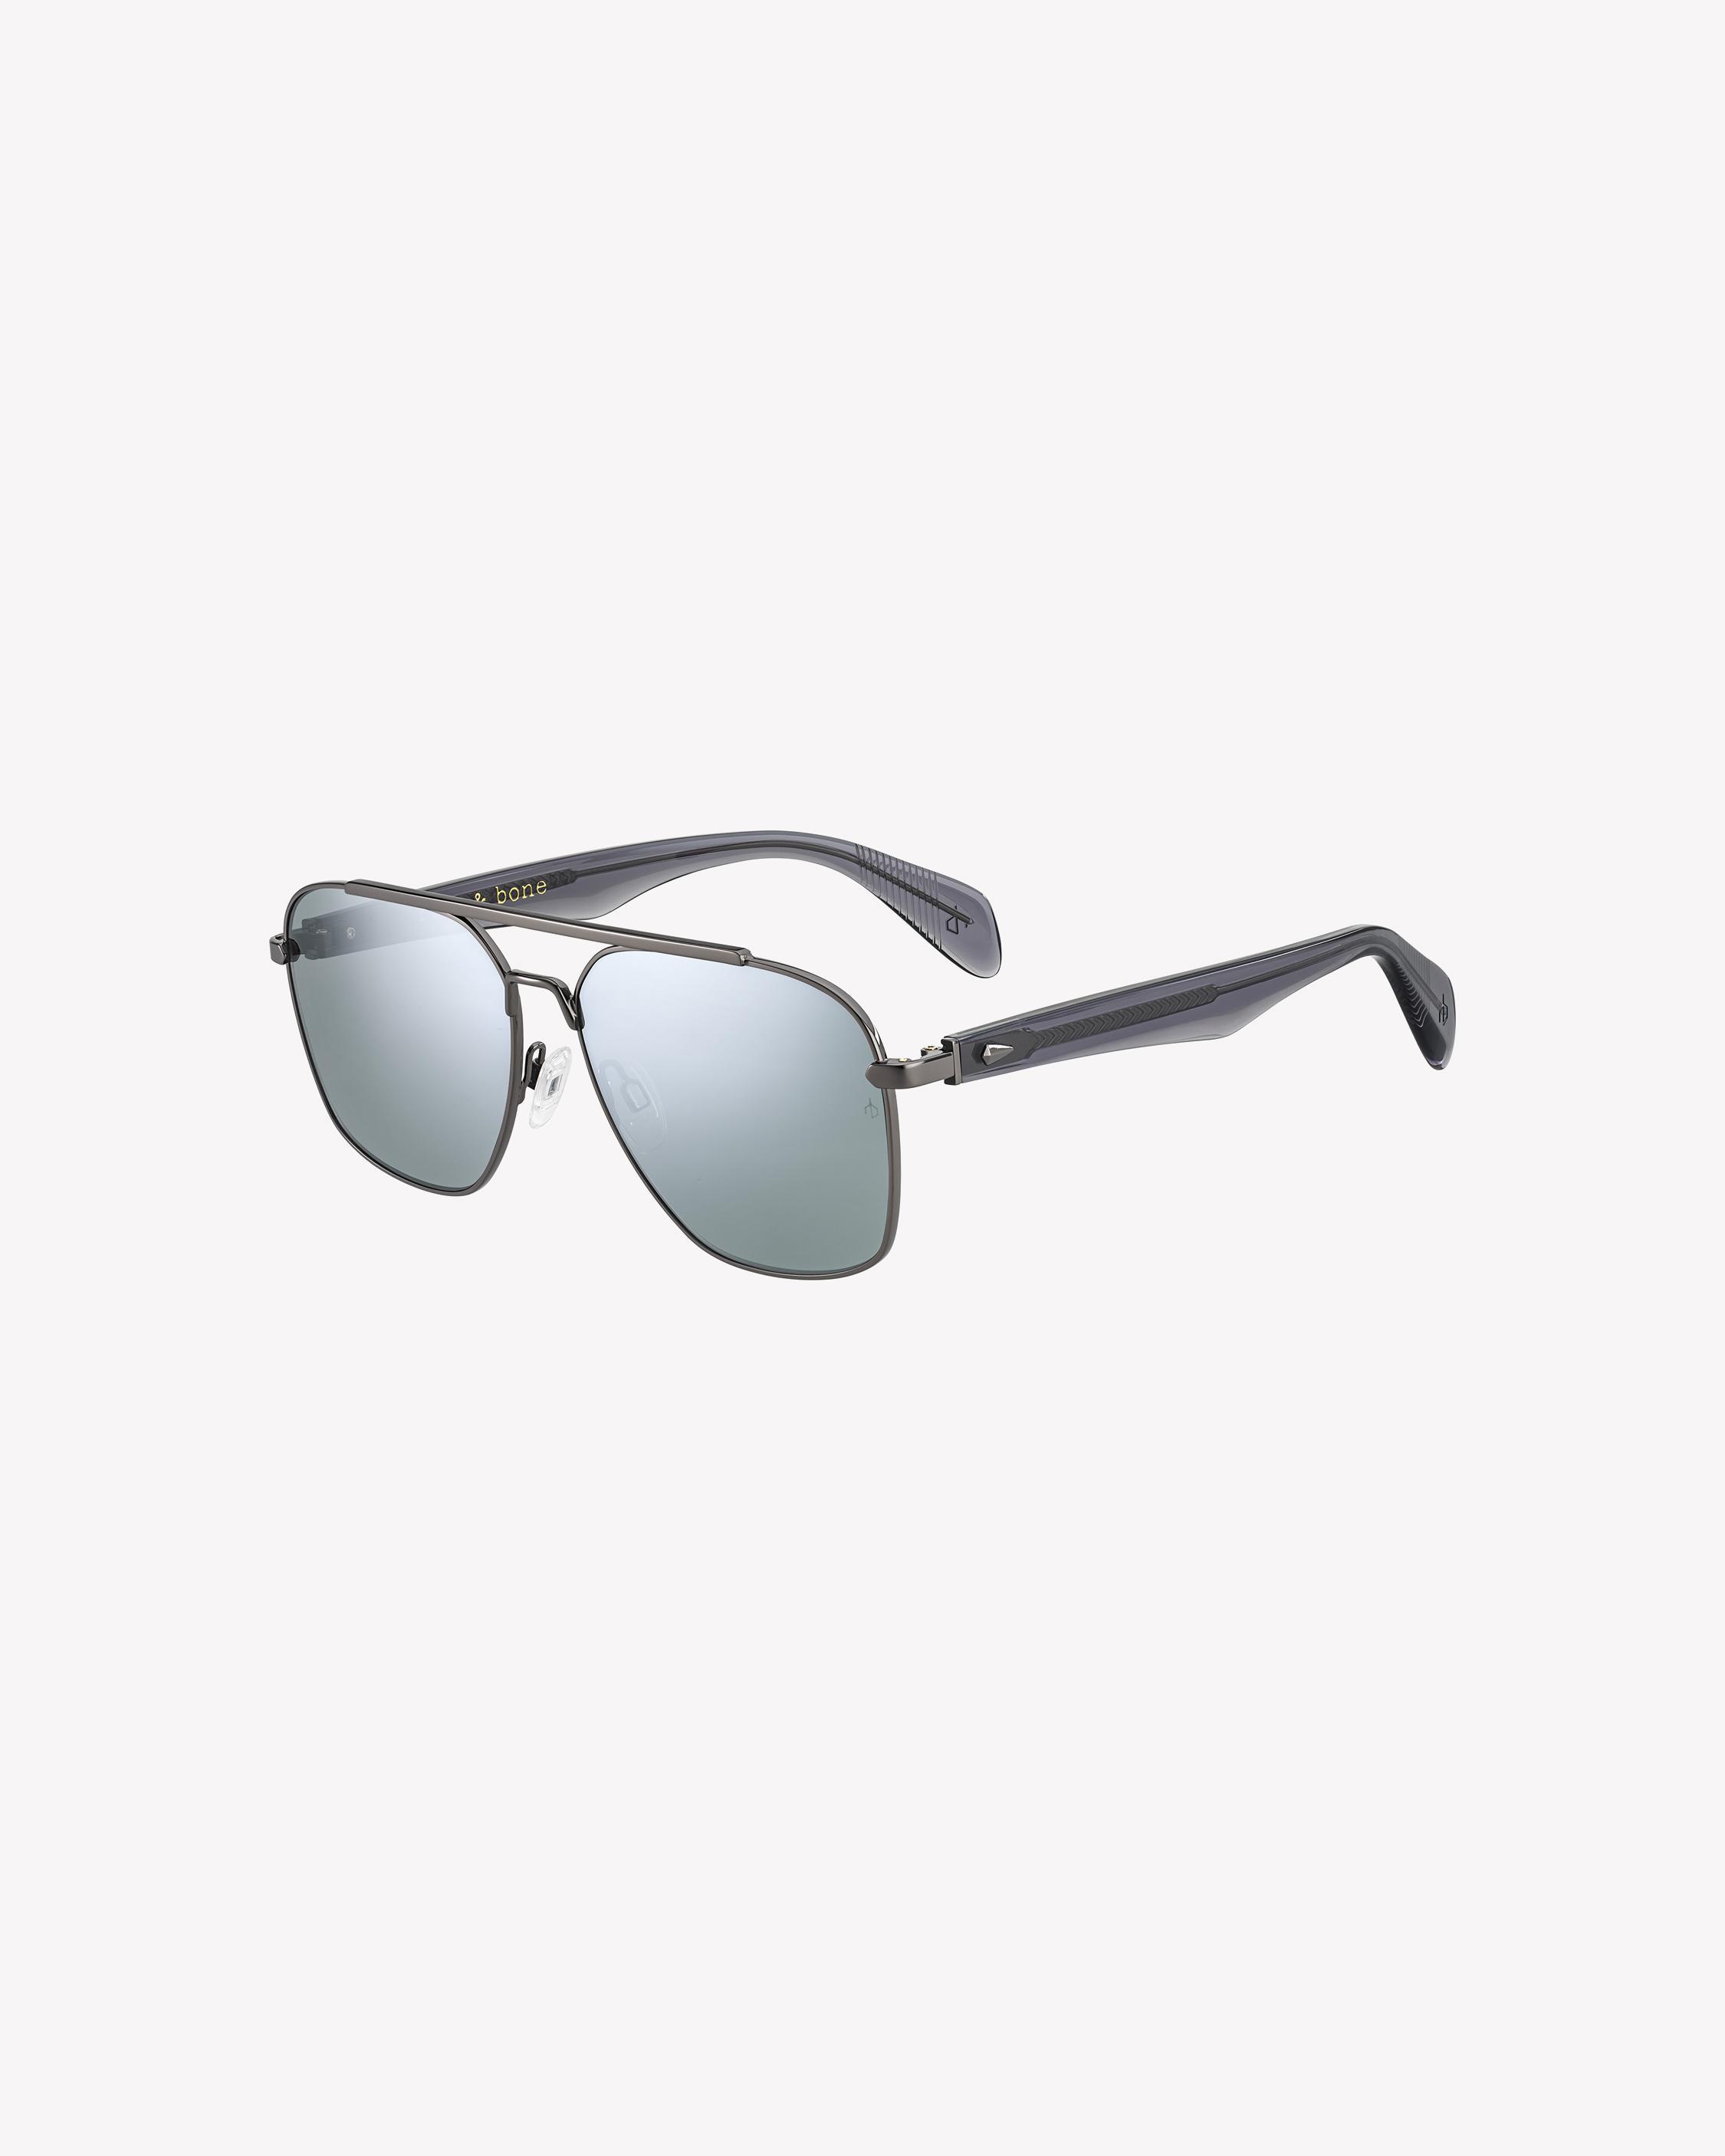 2ba558b7a7 Falco. Balenciaga Black Thin Rectangular Sunglasses ( 460) ❤ liked on Polyvore  featuring accessories ...